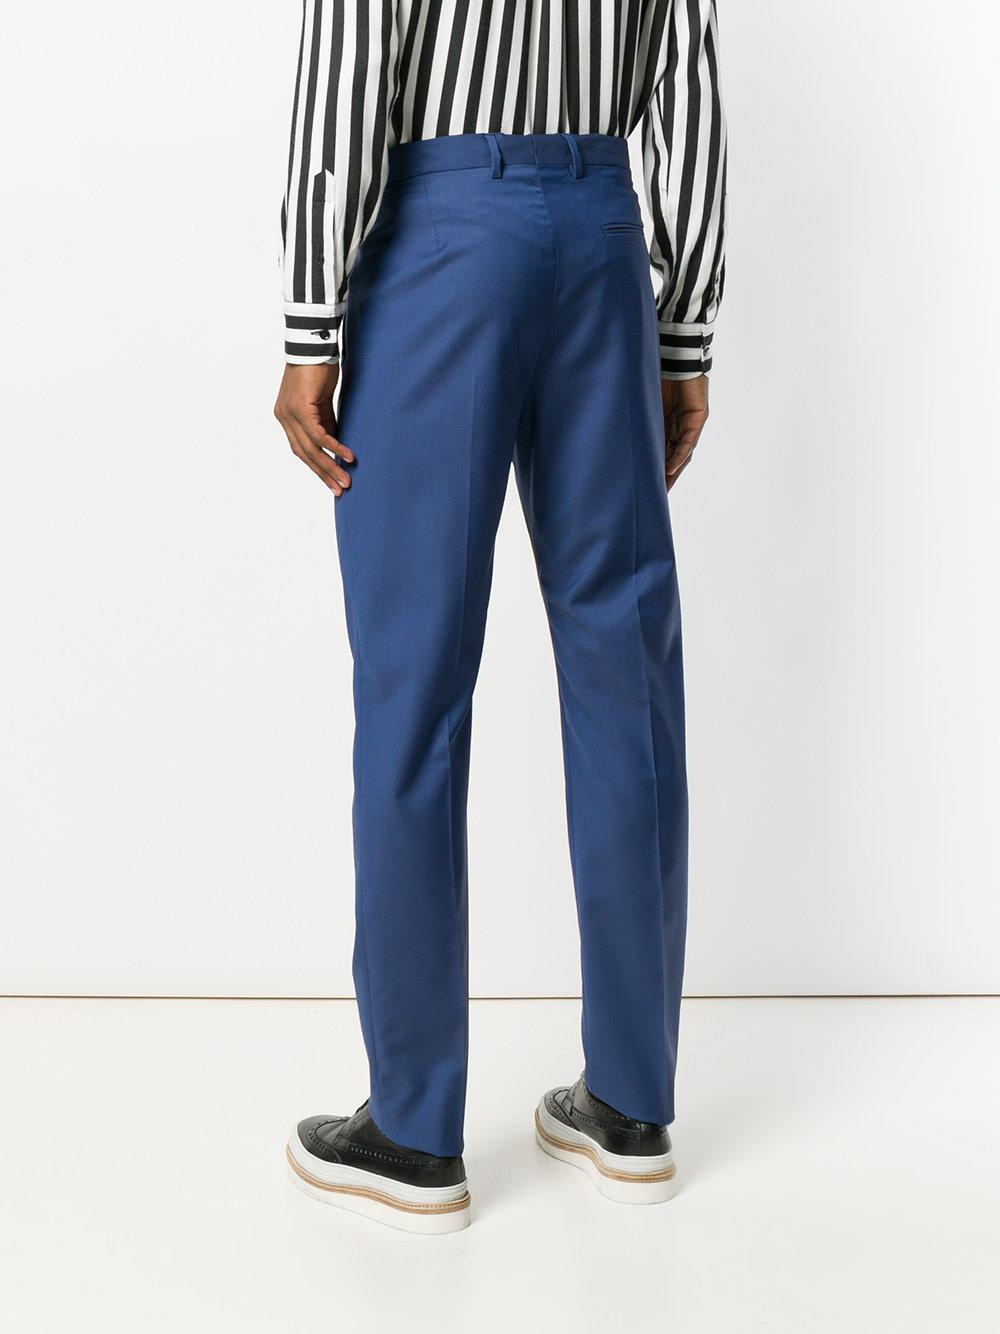 Pantalon Slim Fit - Bleu Vivienne Westwood BJcjI5